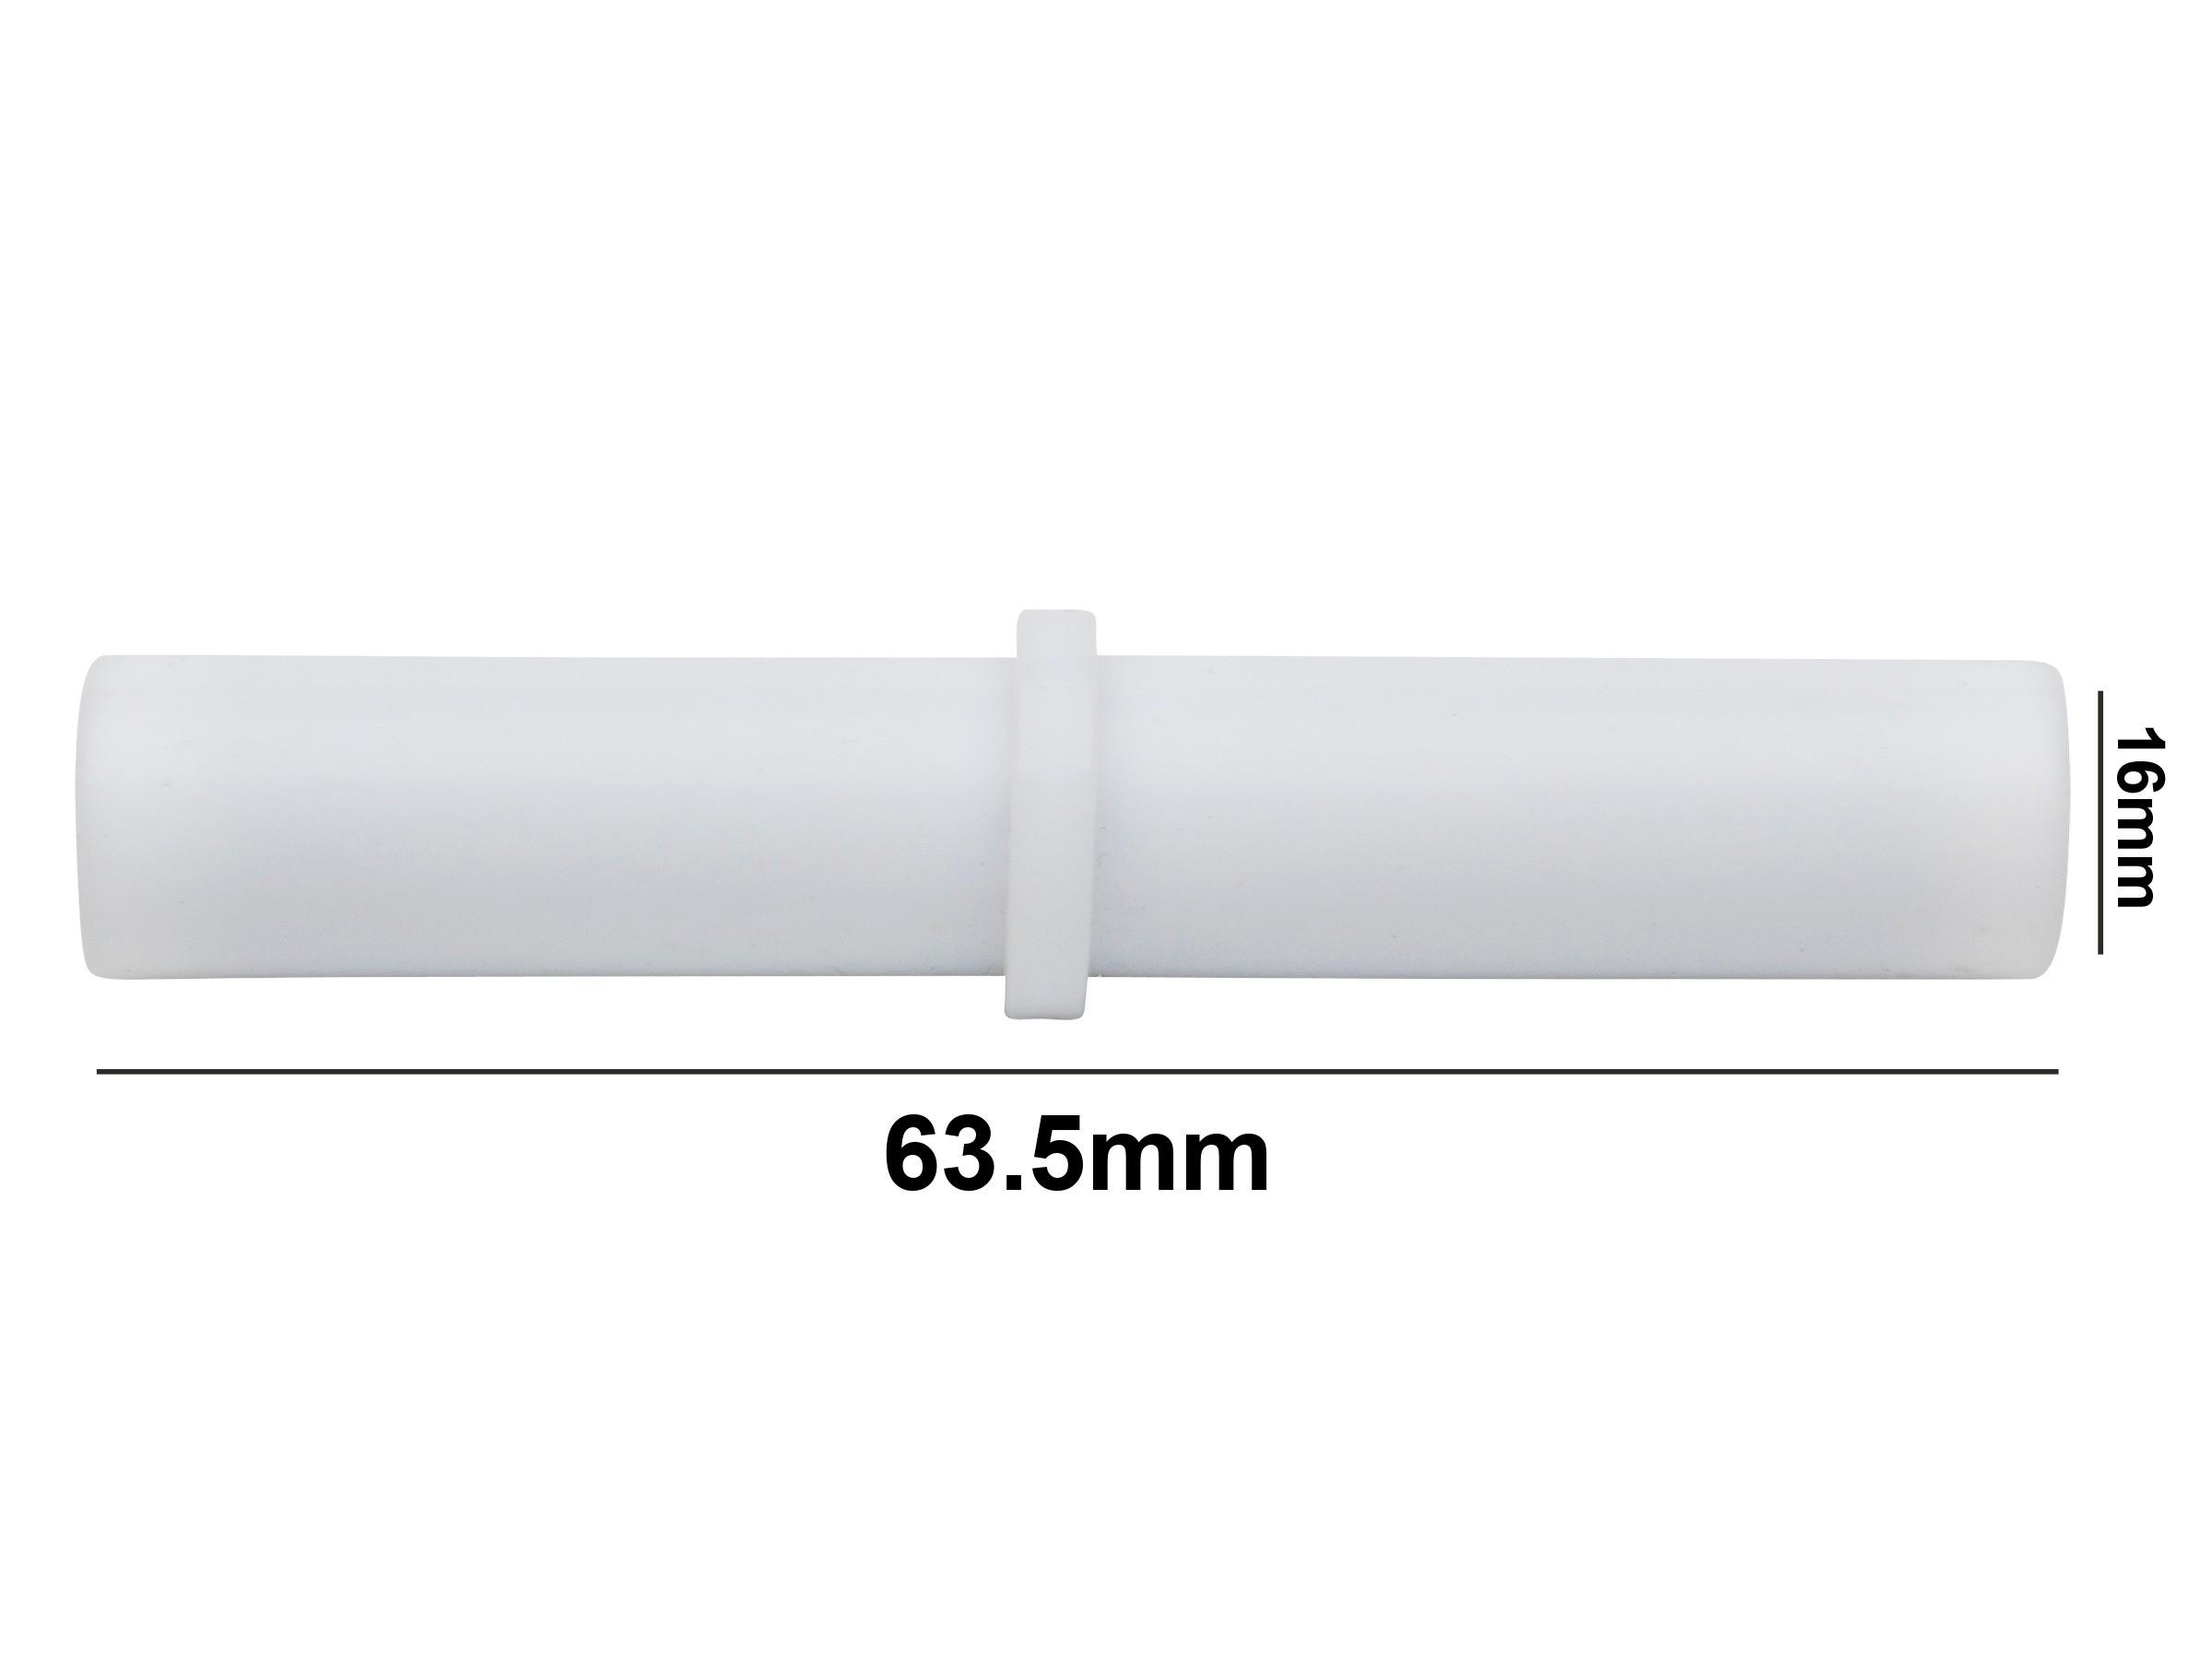 SP Bel-Art Spinbar Teflon Cylindrical Magnetic Stirring Bar; 63.5 x 16mm, White